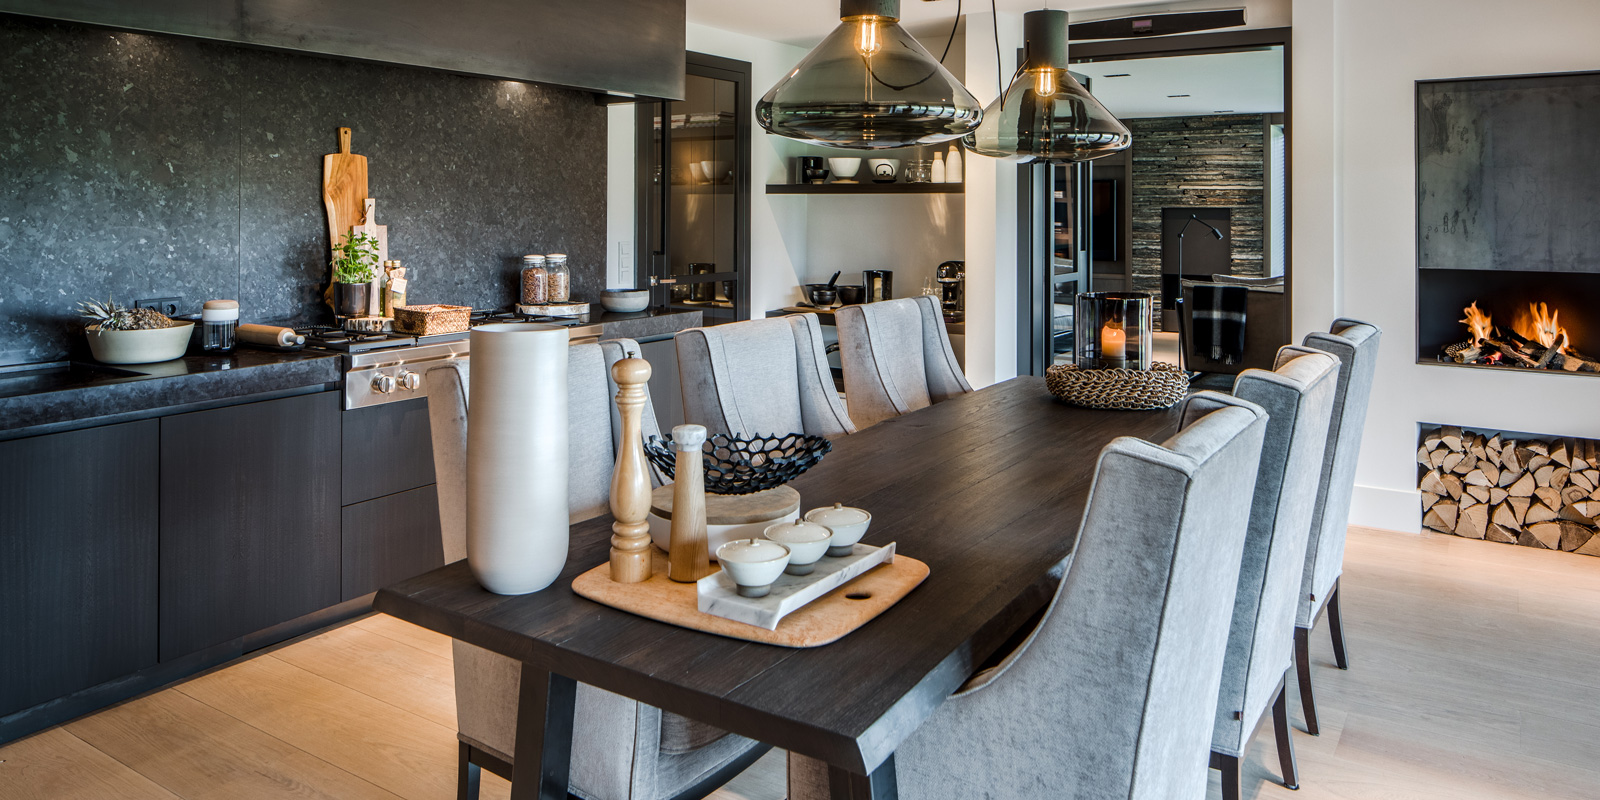 Culimaat, Marcel Wolterinck, luxe keukens, droomkeuken, high-end keuken